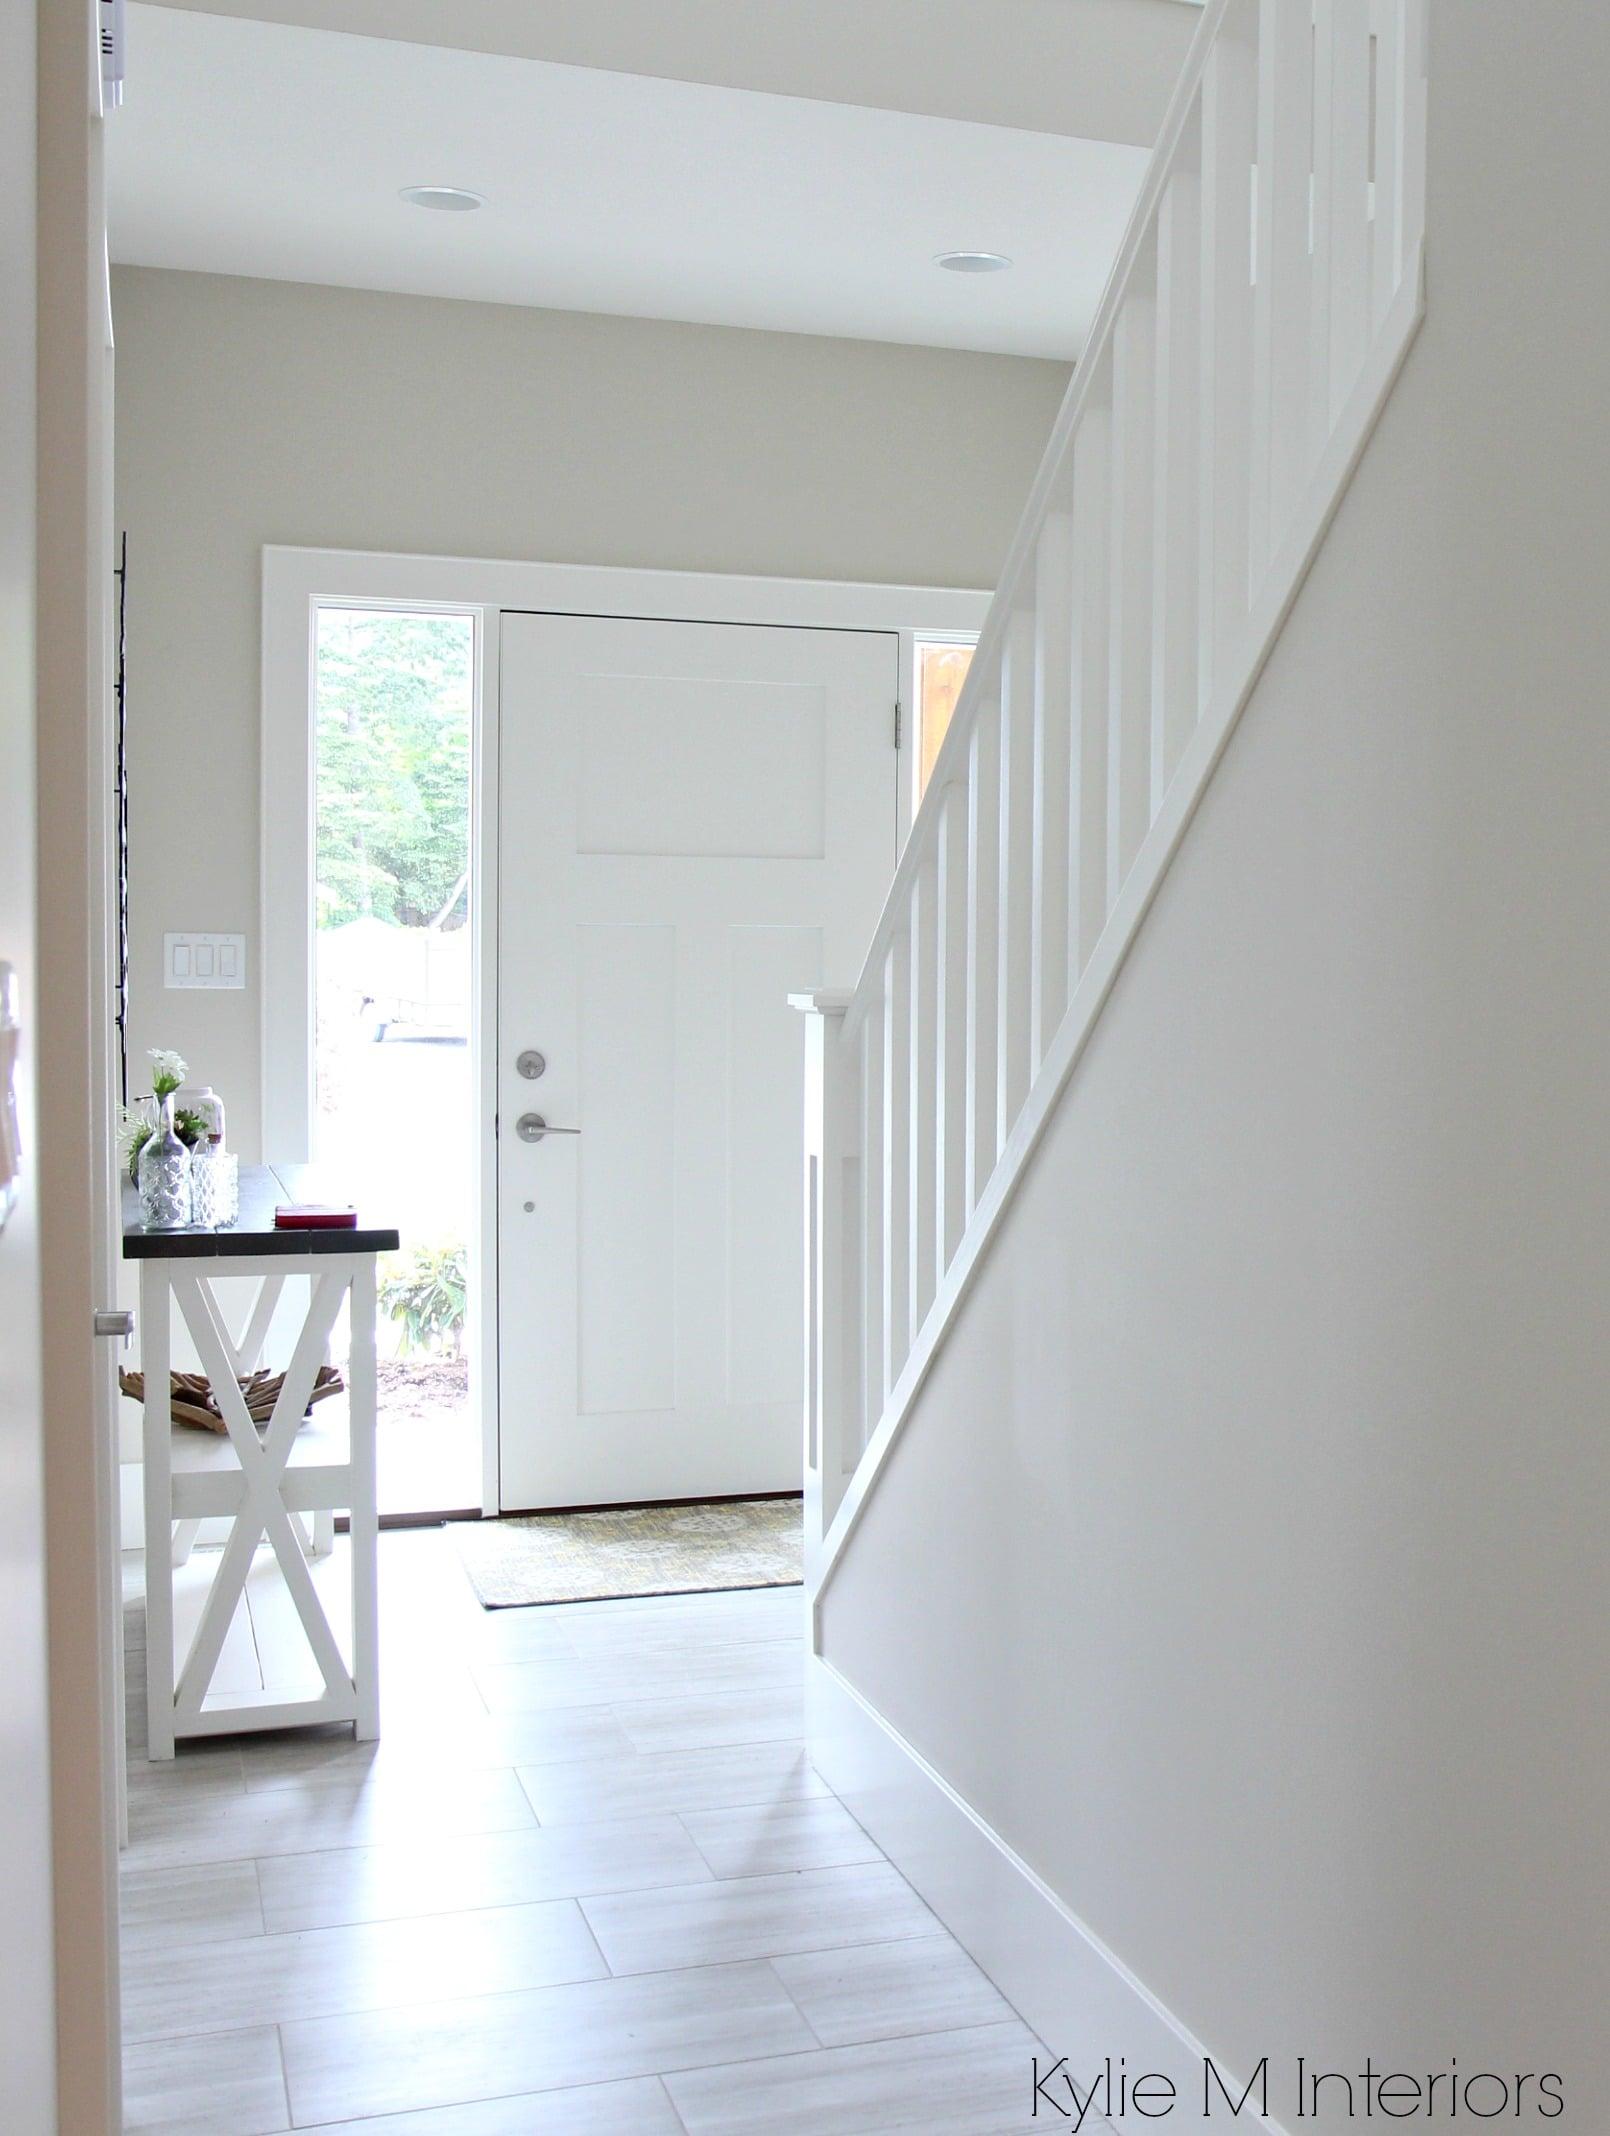 Lighting Basement Washroom Stairs: Benjamin-moore-edgecomb-gray-or-greige-in-entryway-foyer